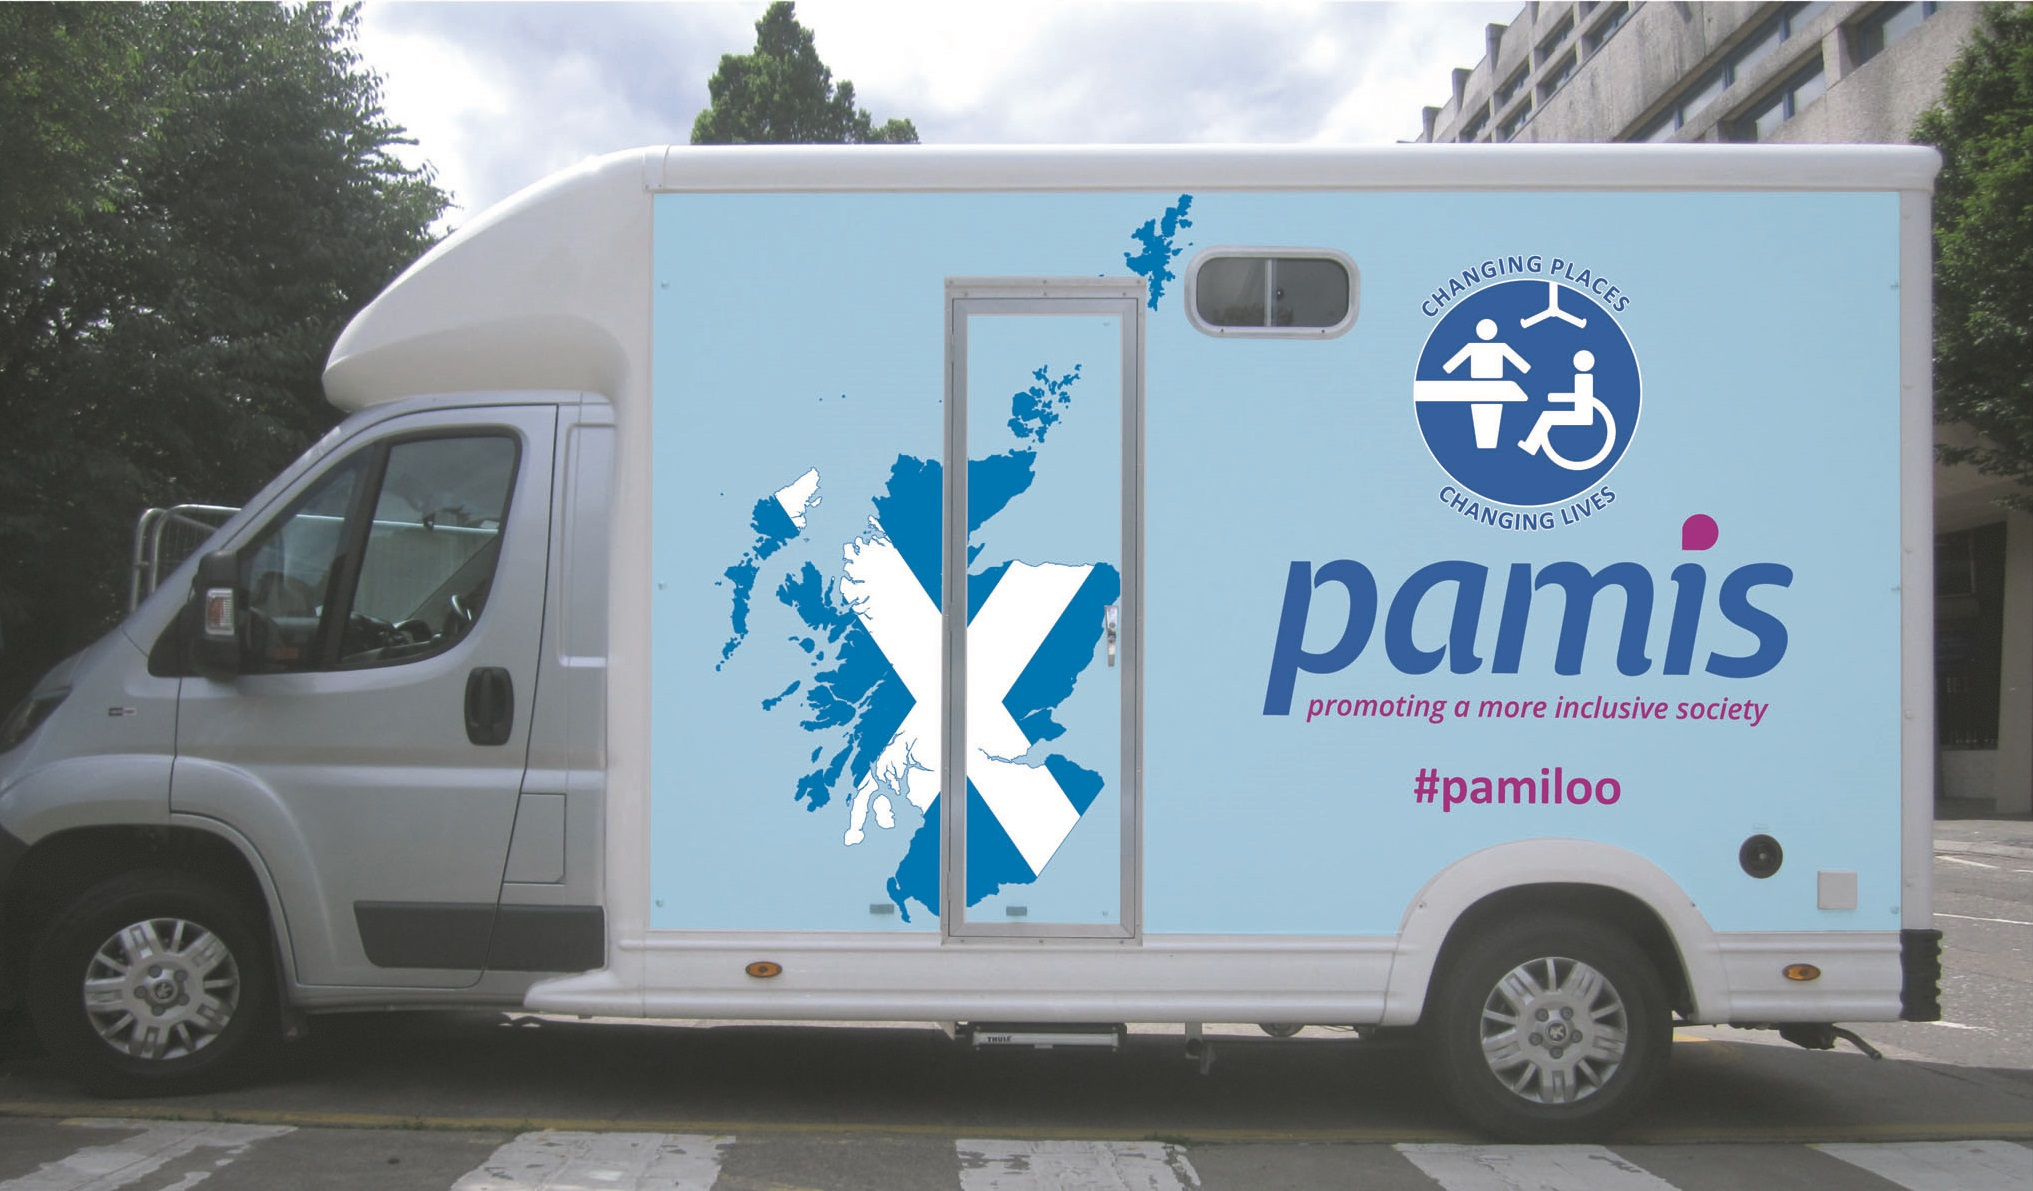 The pamiloo